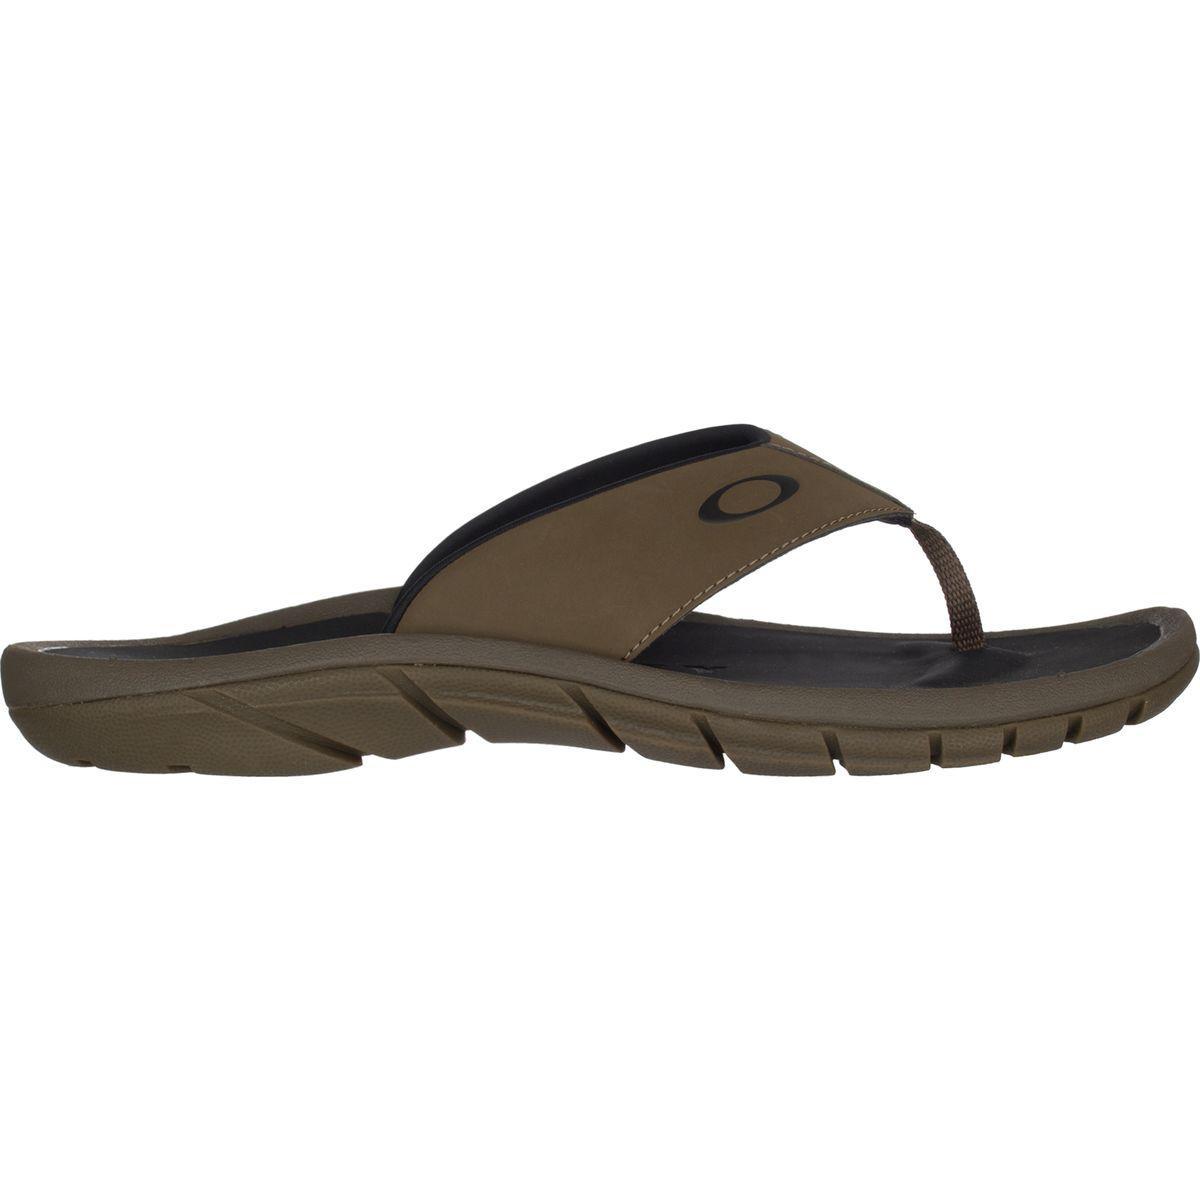 4cbc1a16c162 Lyst - Oakley Super Coil 2.0 Sandal in Brown